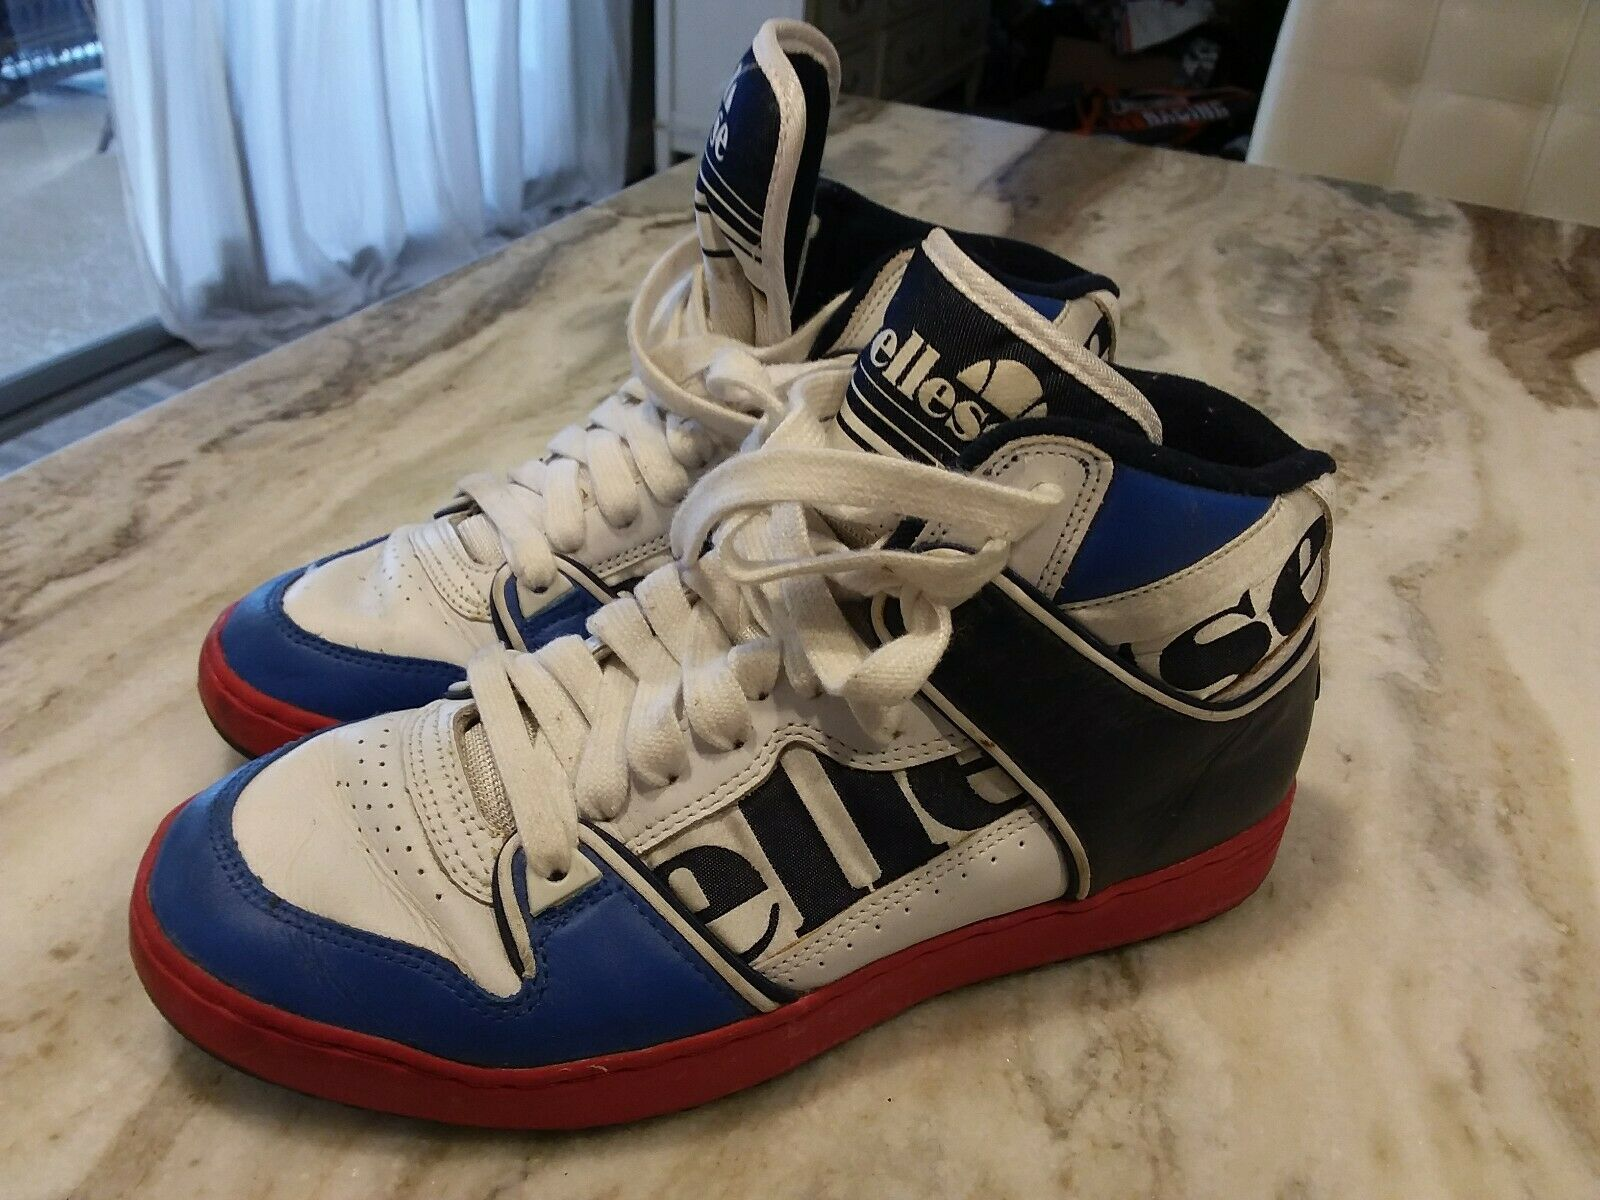 Vintage Ellesse Tenis Zapatos Talla 42 EE. UU. 9 Raro 80s 90s Rara Vintage